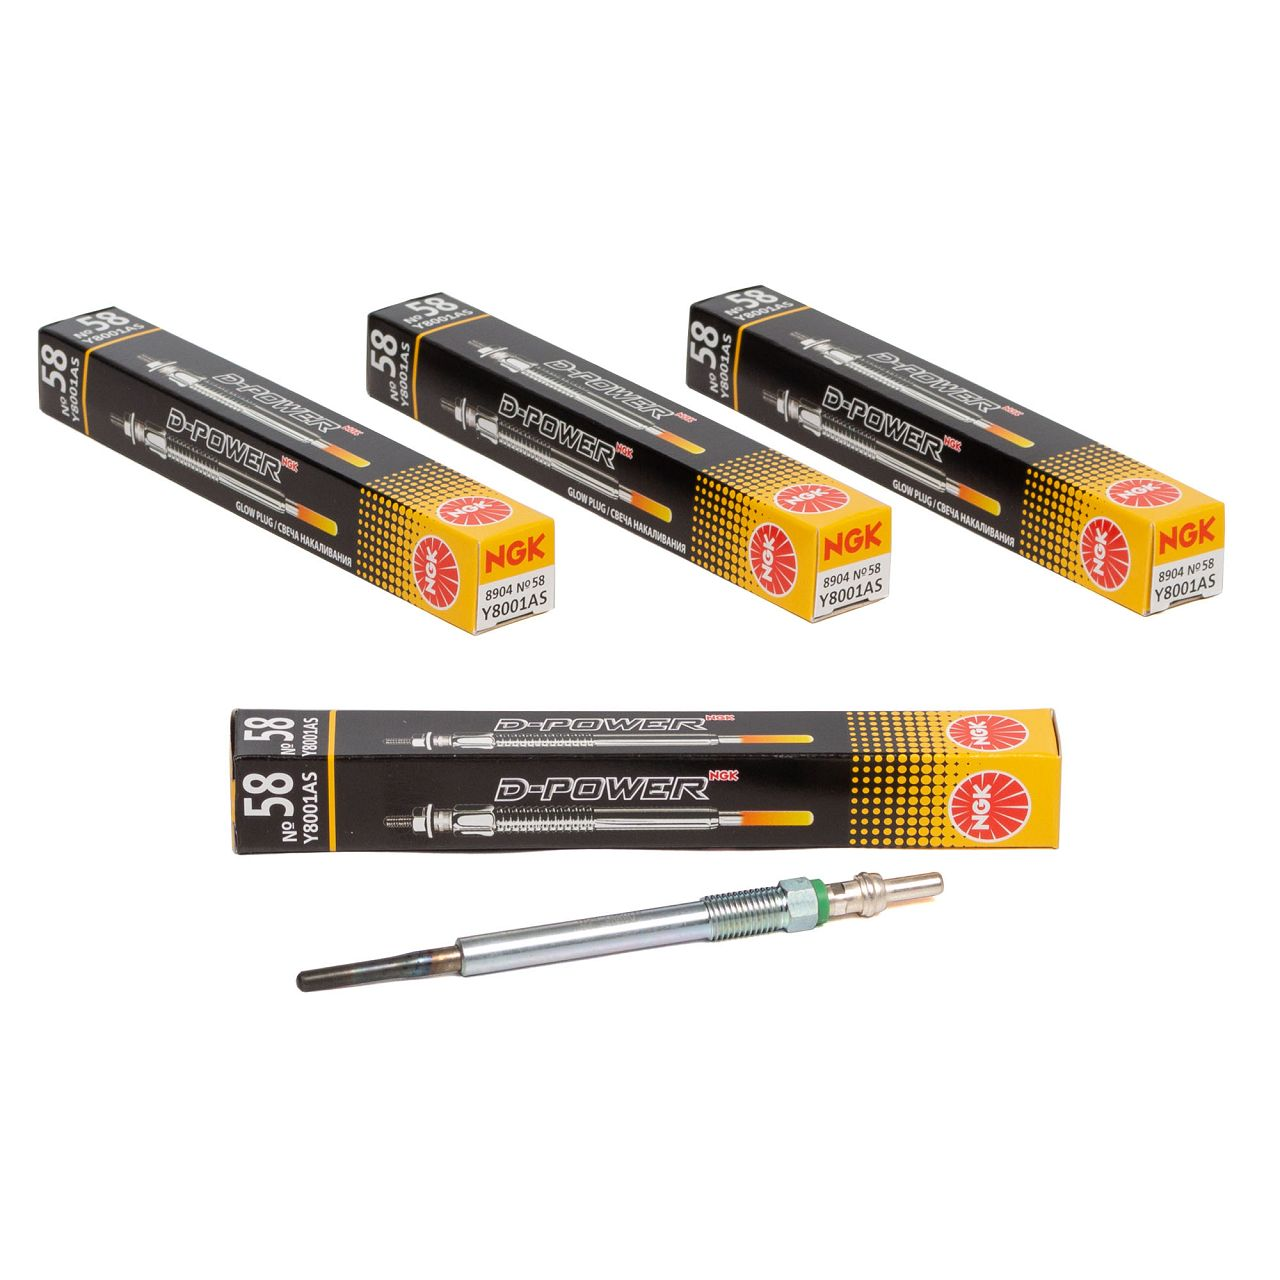 4x NGK 8904 Y8001AS D-POWER 58 Glühkerze CITROEN FORD PEUGEOT 1.5-2.0 DIESEL